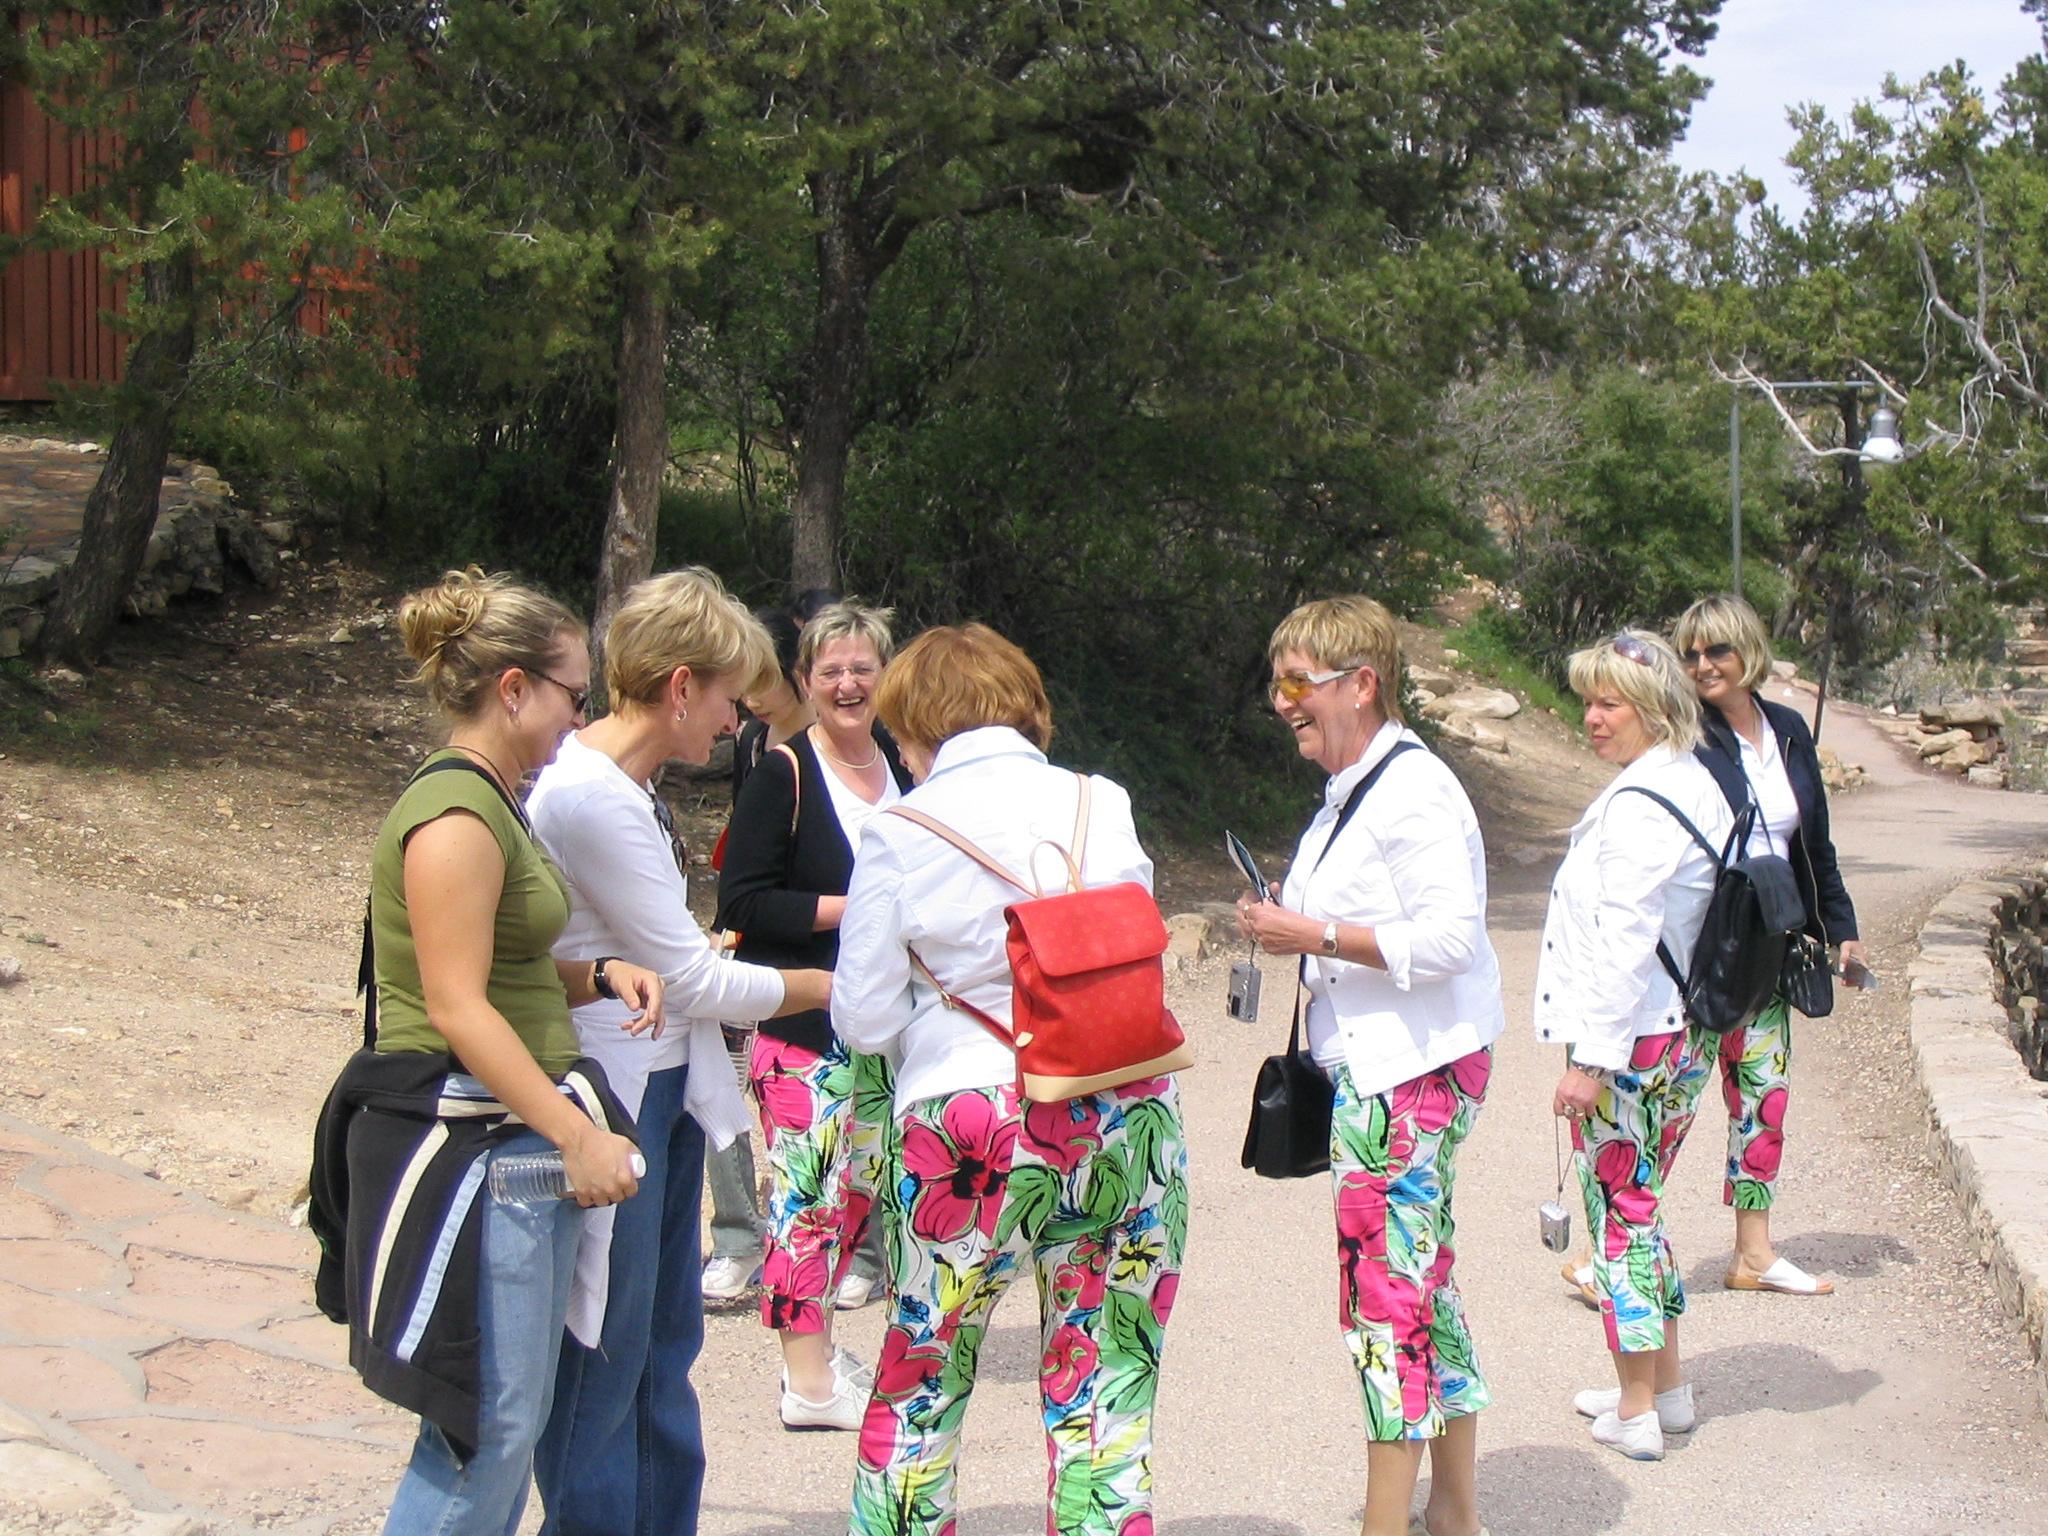 German girls in Grand Canyon